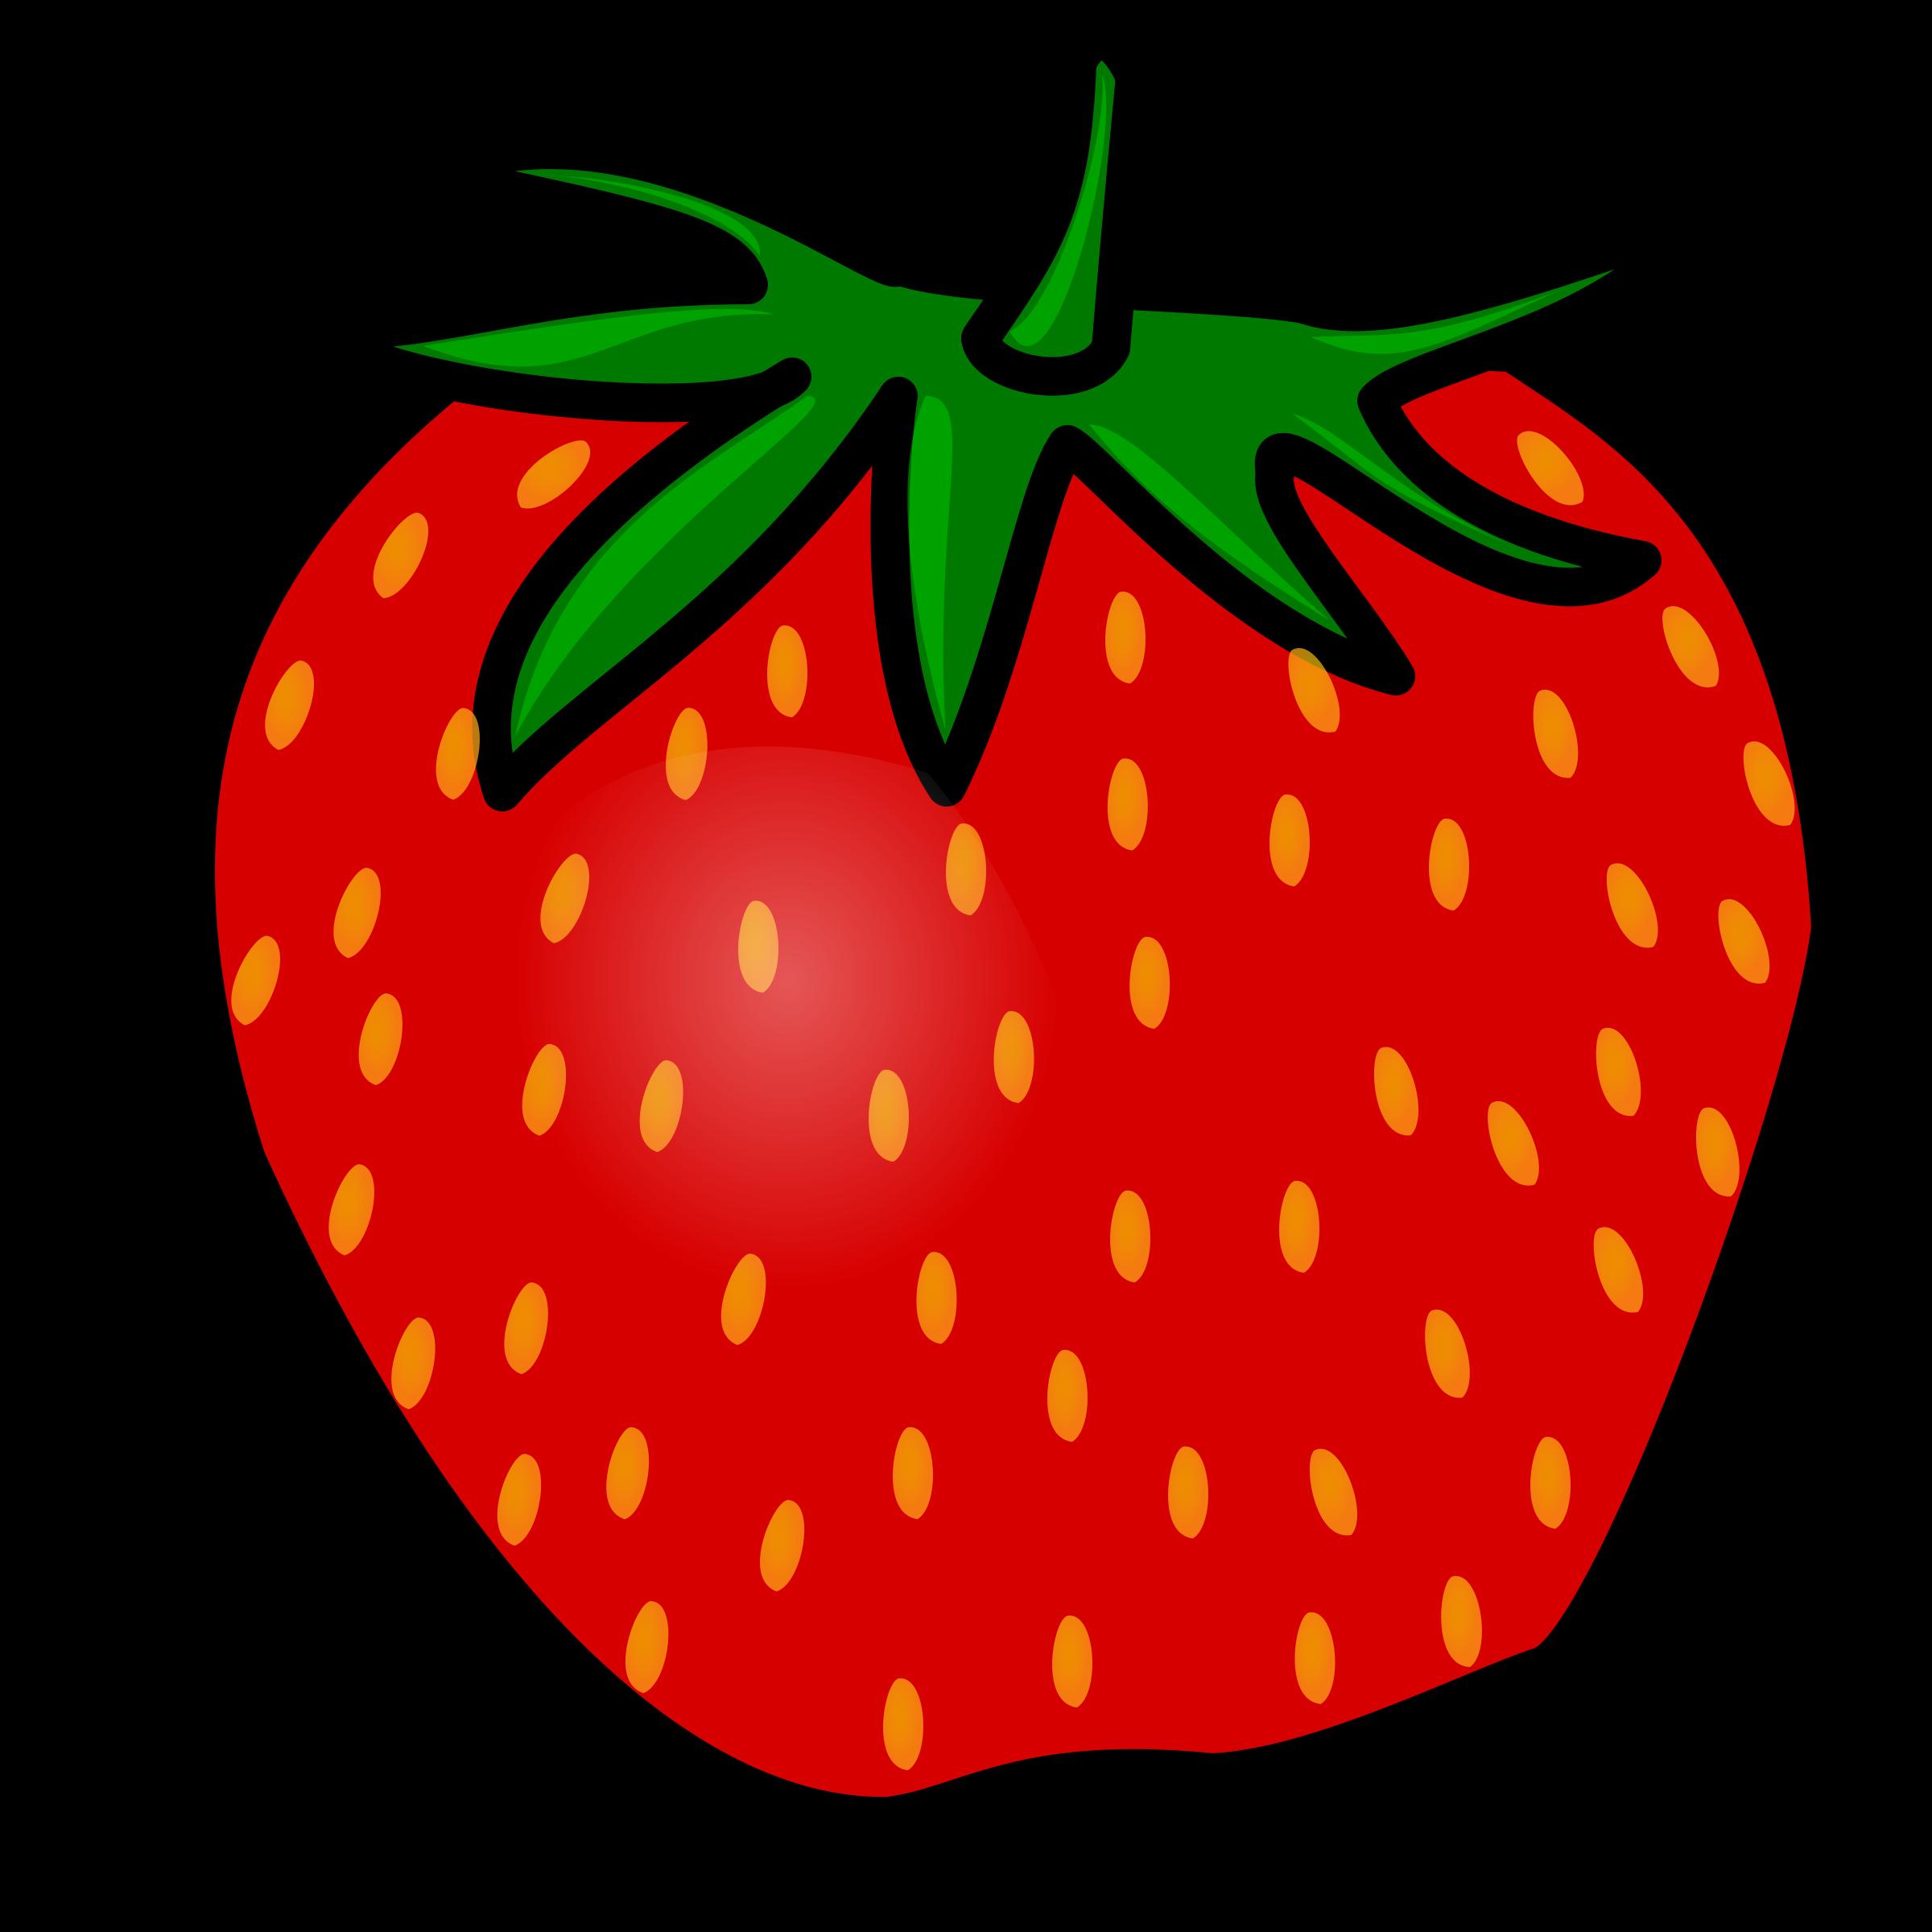 Strawberry panda free images. Strawberries clipart animasi